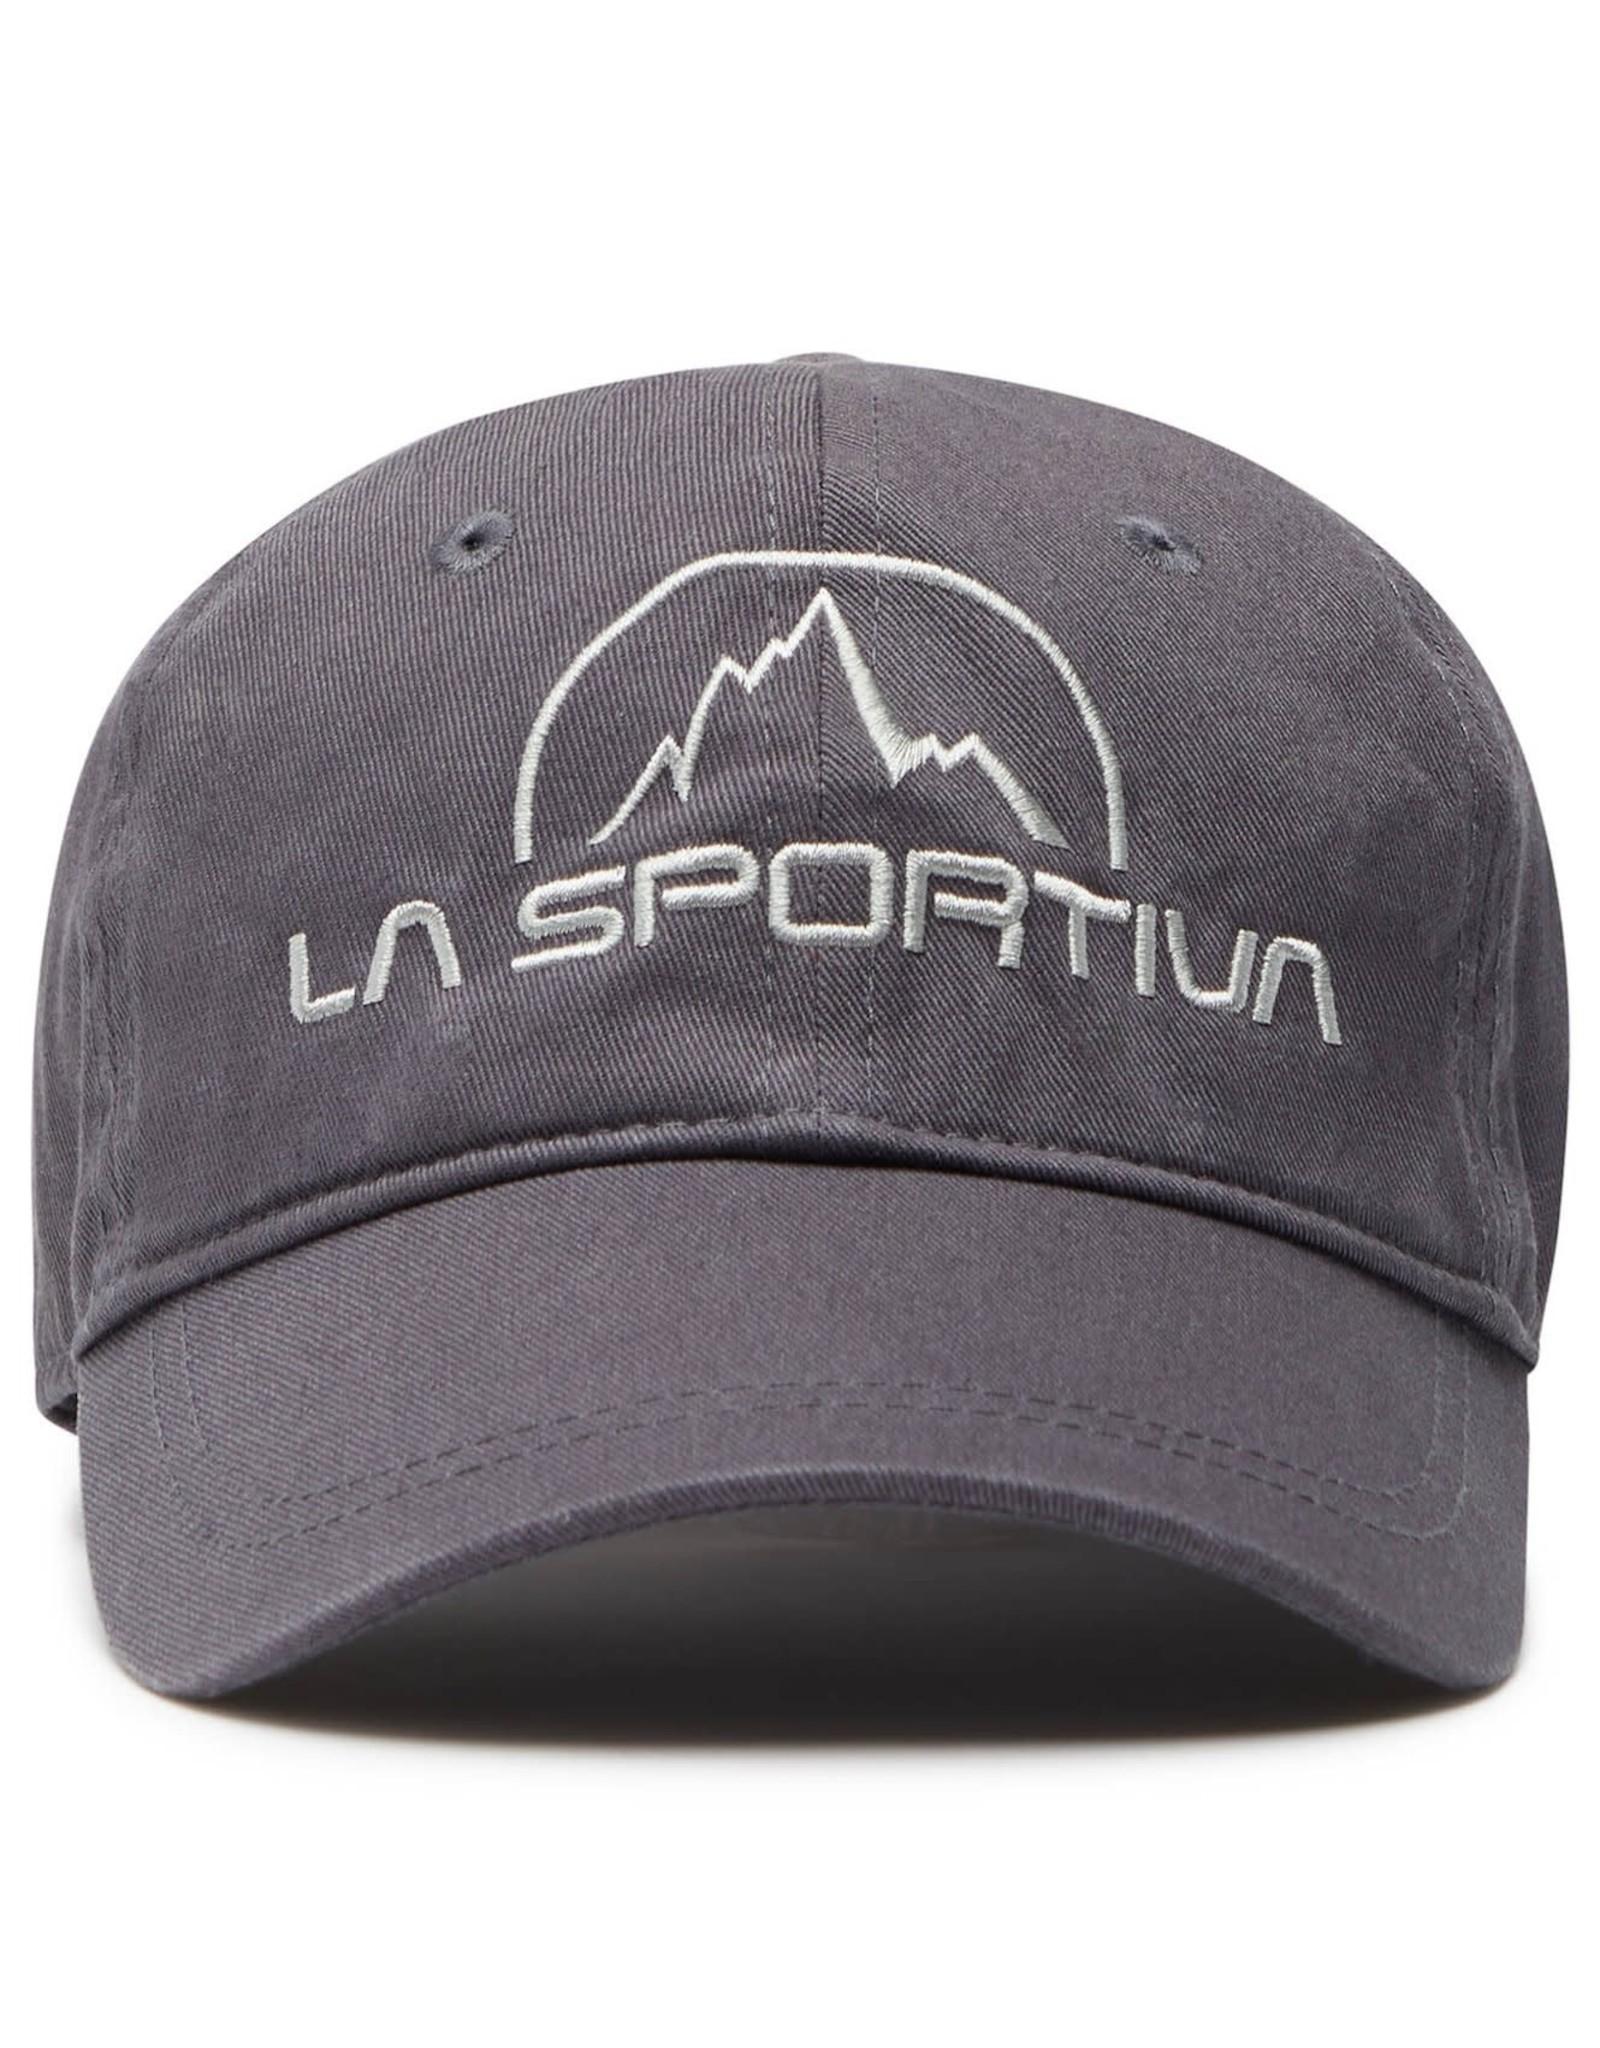 La Sportiva La Sportiva Hike Cap - Unisex